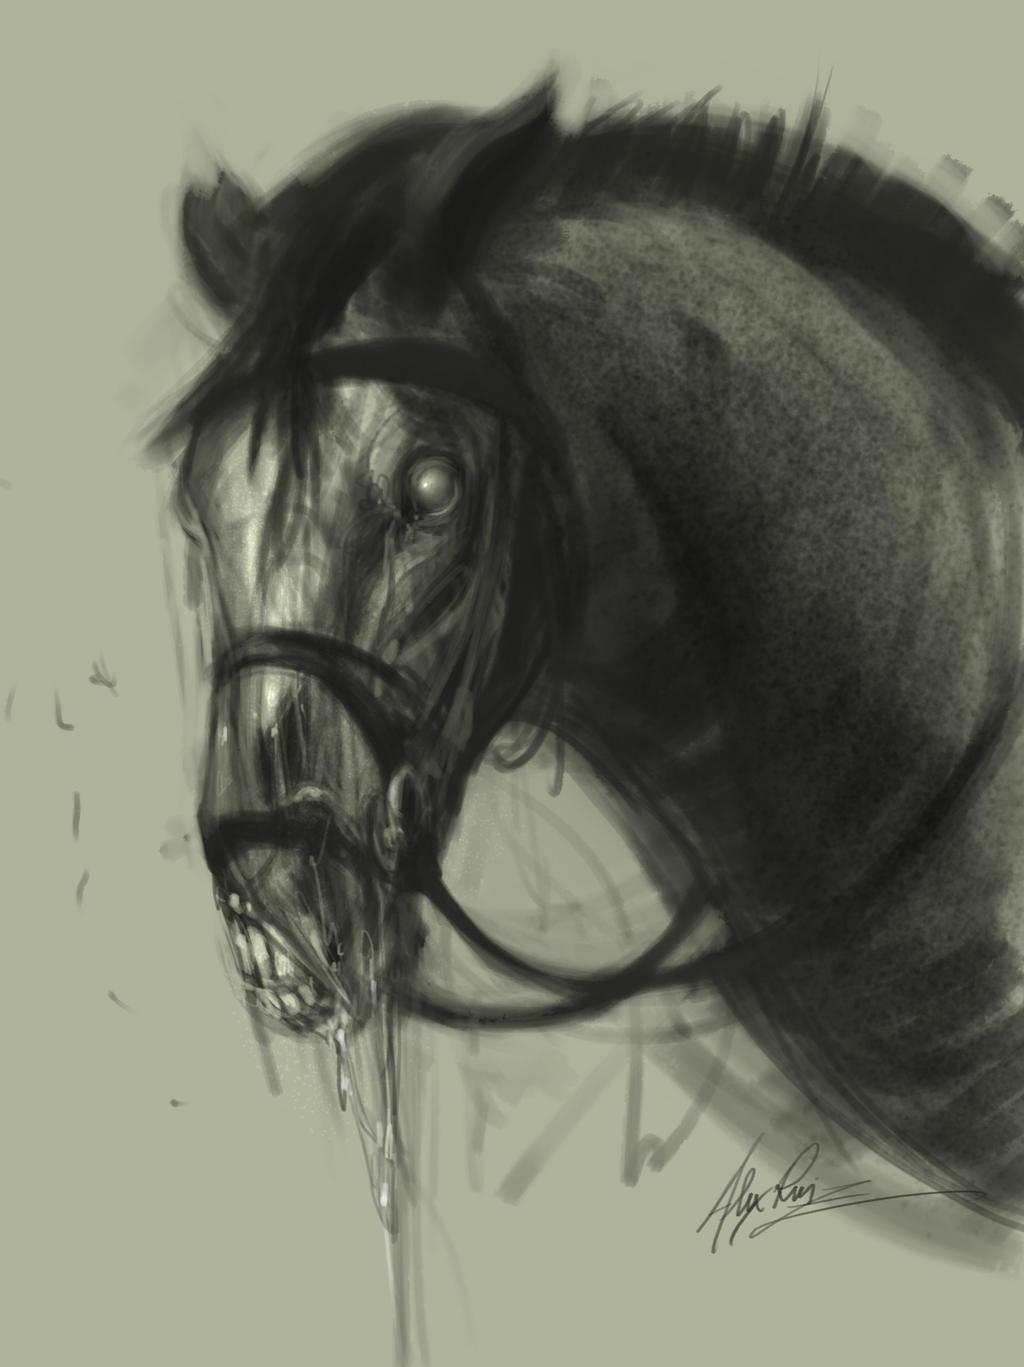 Zombie Horse by AlexRuizArt on DeviantArt